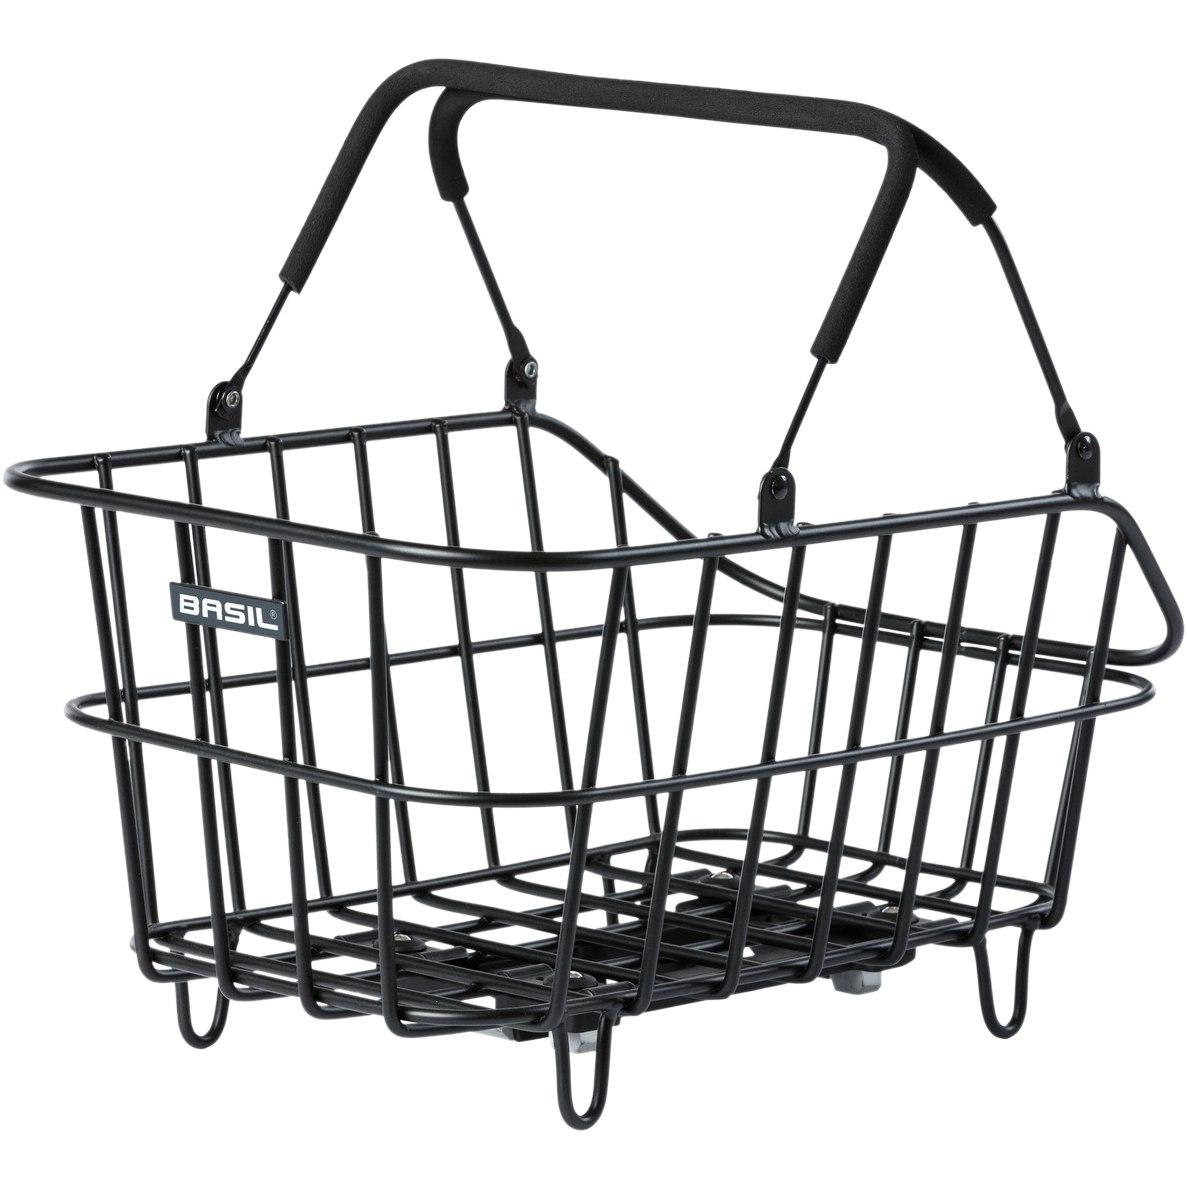 Basil Cento Alu MIK Bike Basket - matt black